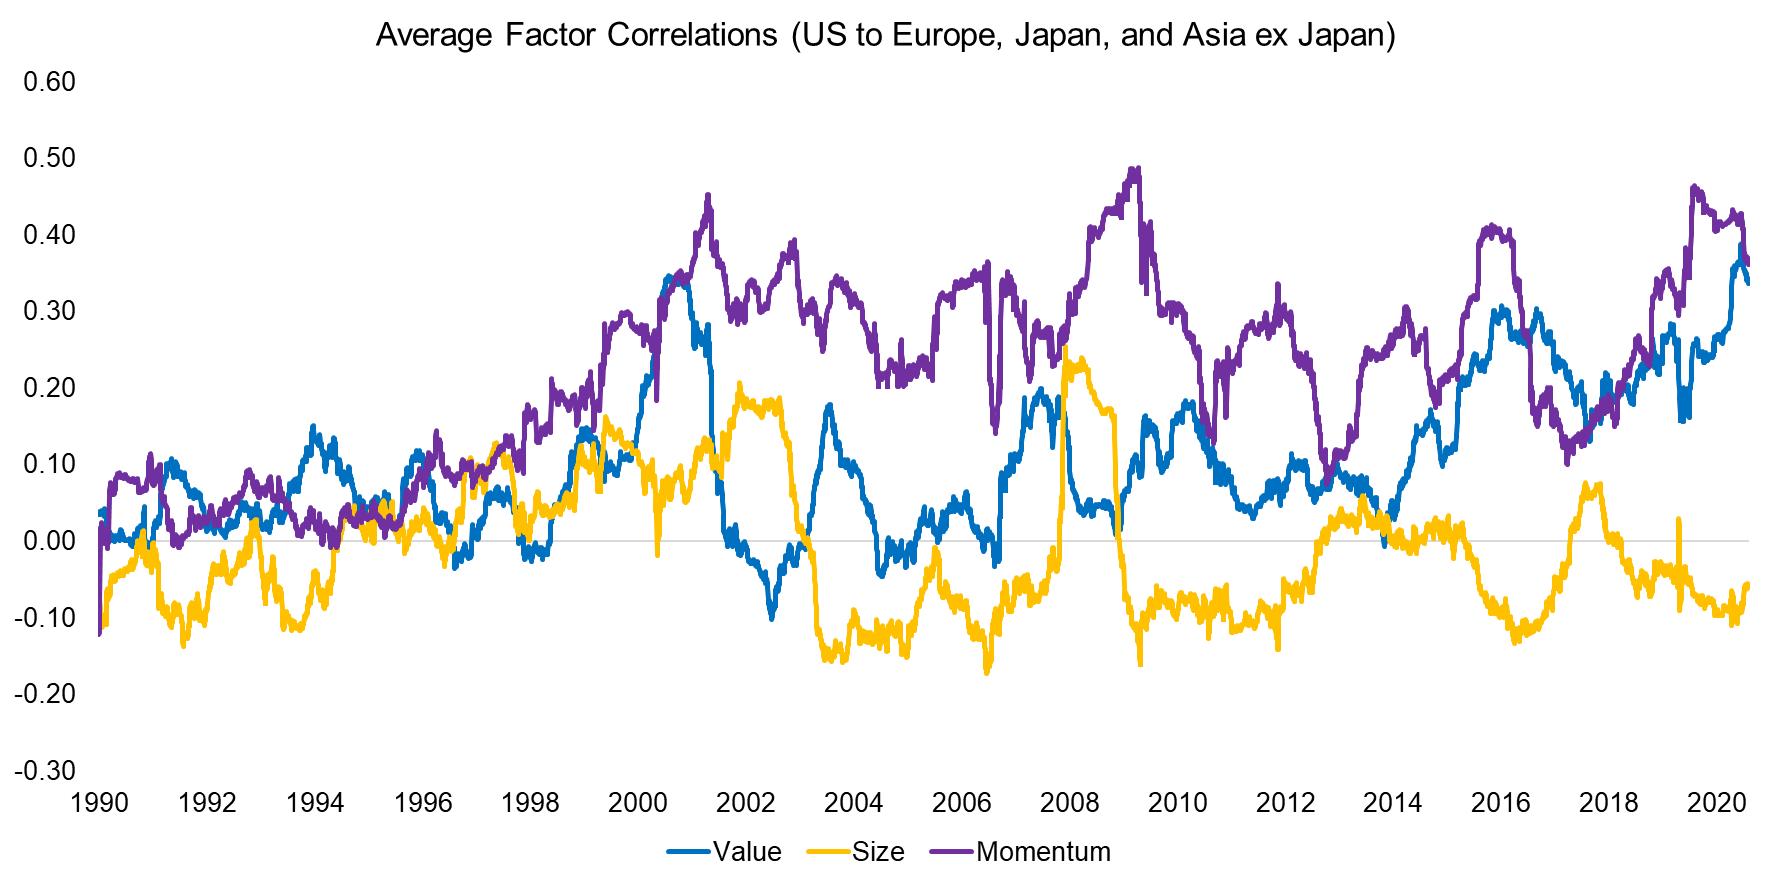 Average Factor Correlations across Markets (US, Europe, Japan, Asia ex Japan)